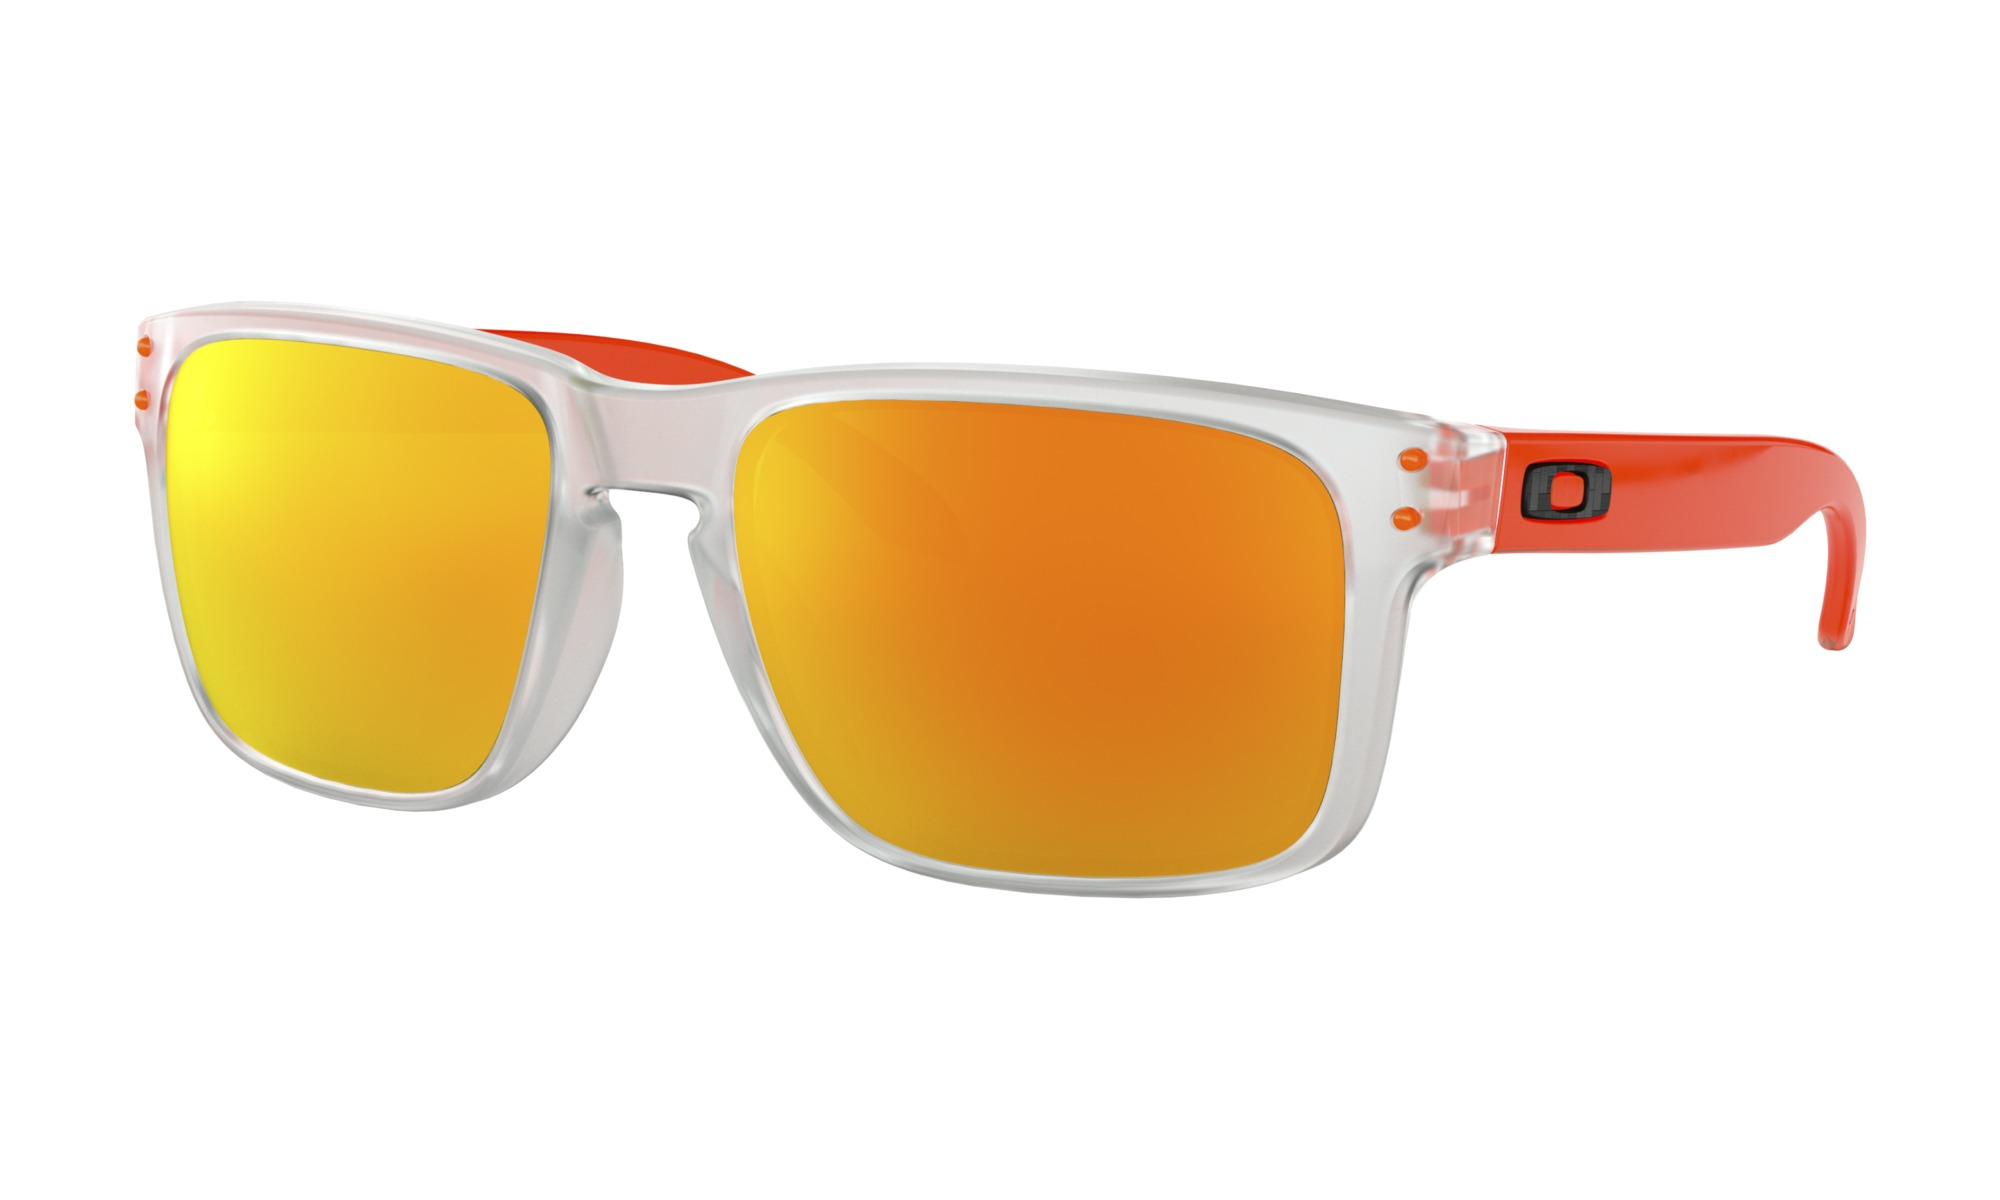 e39d467a07 Oakley Holbrook Progressive Rx Sun Glasses